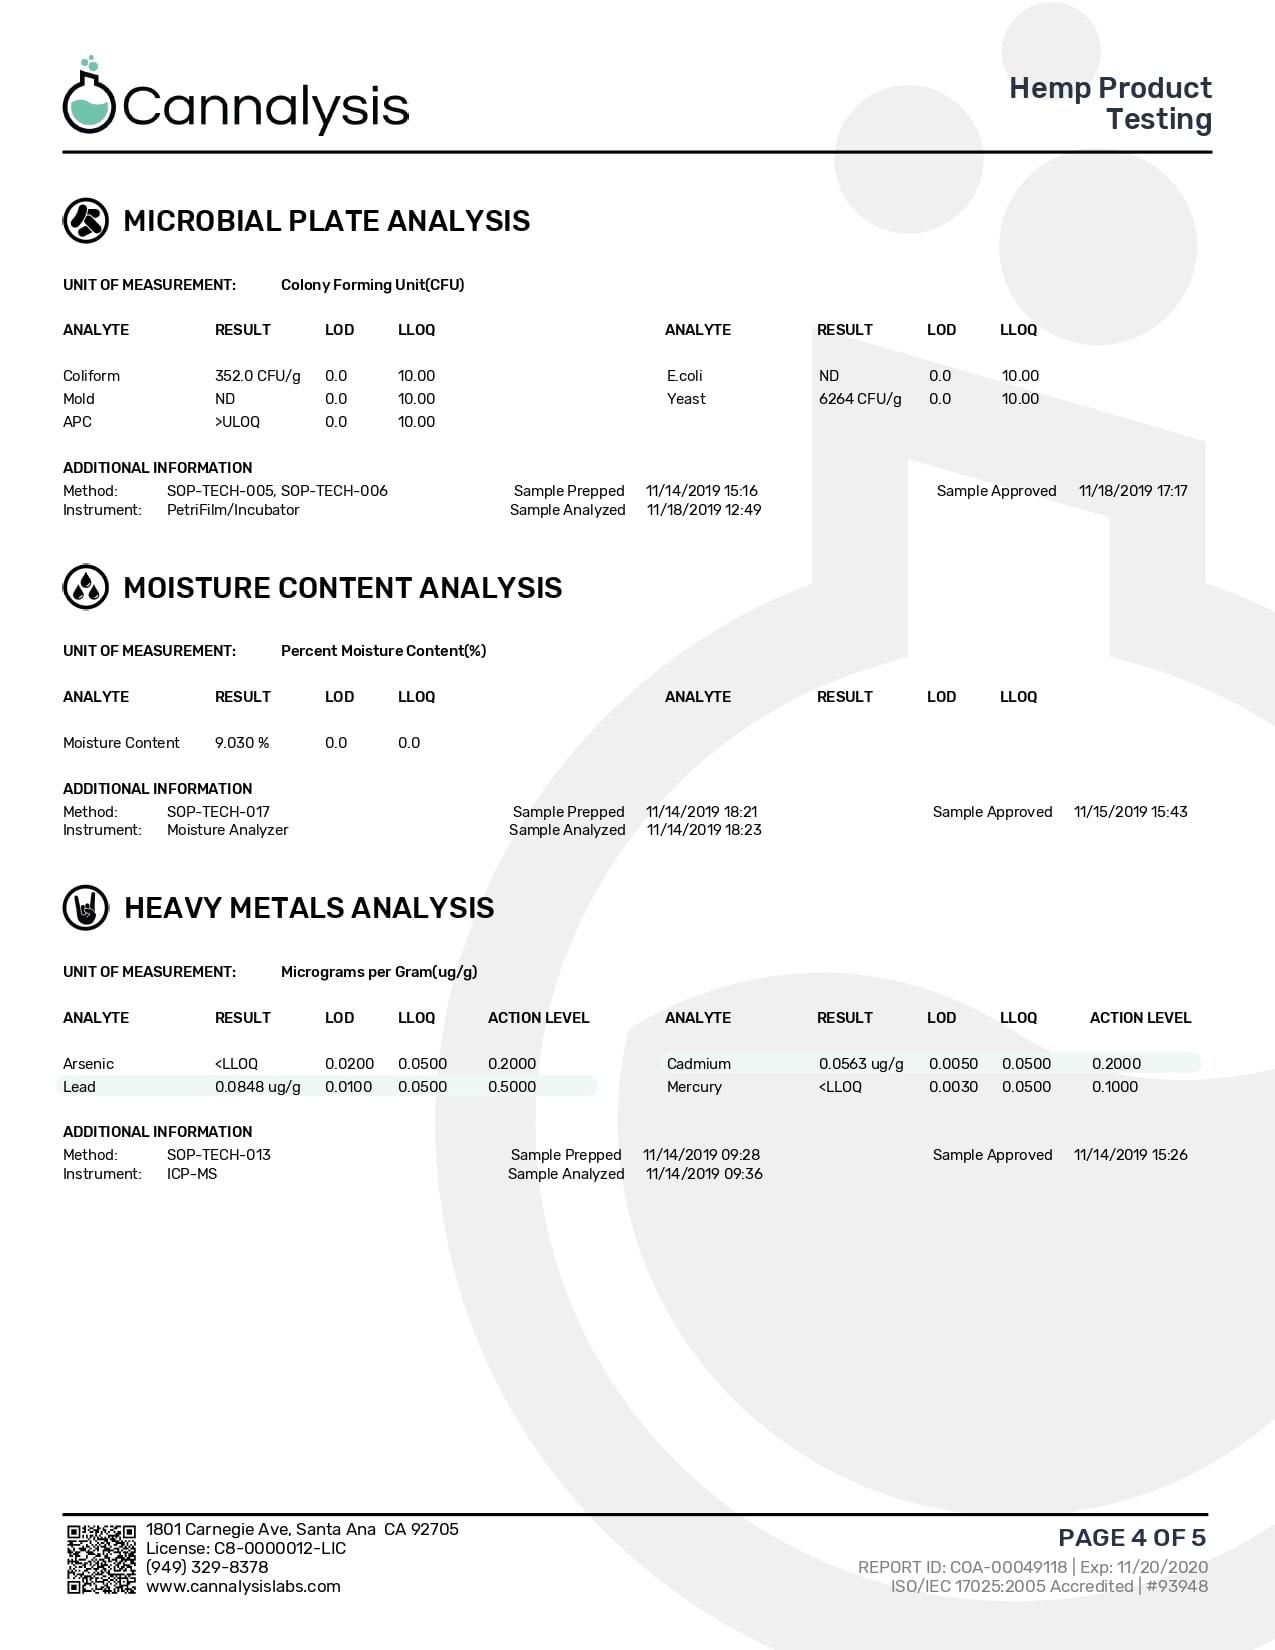 Root Wellness Hemp CBG Pre Roll 2 Pack Lab Report